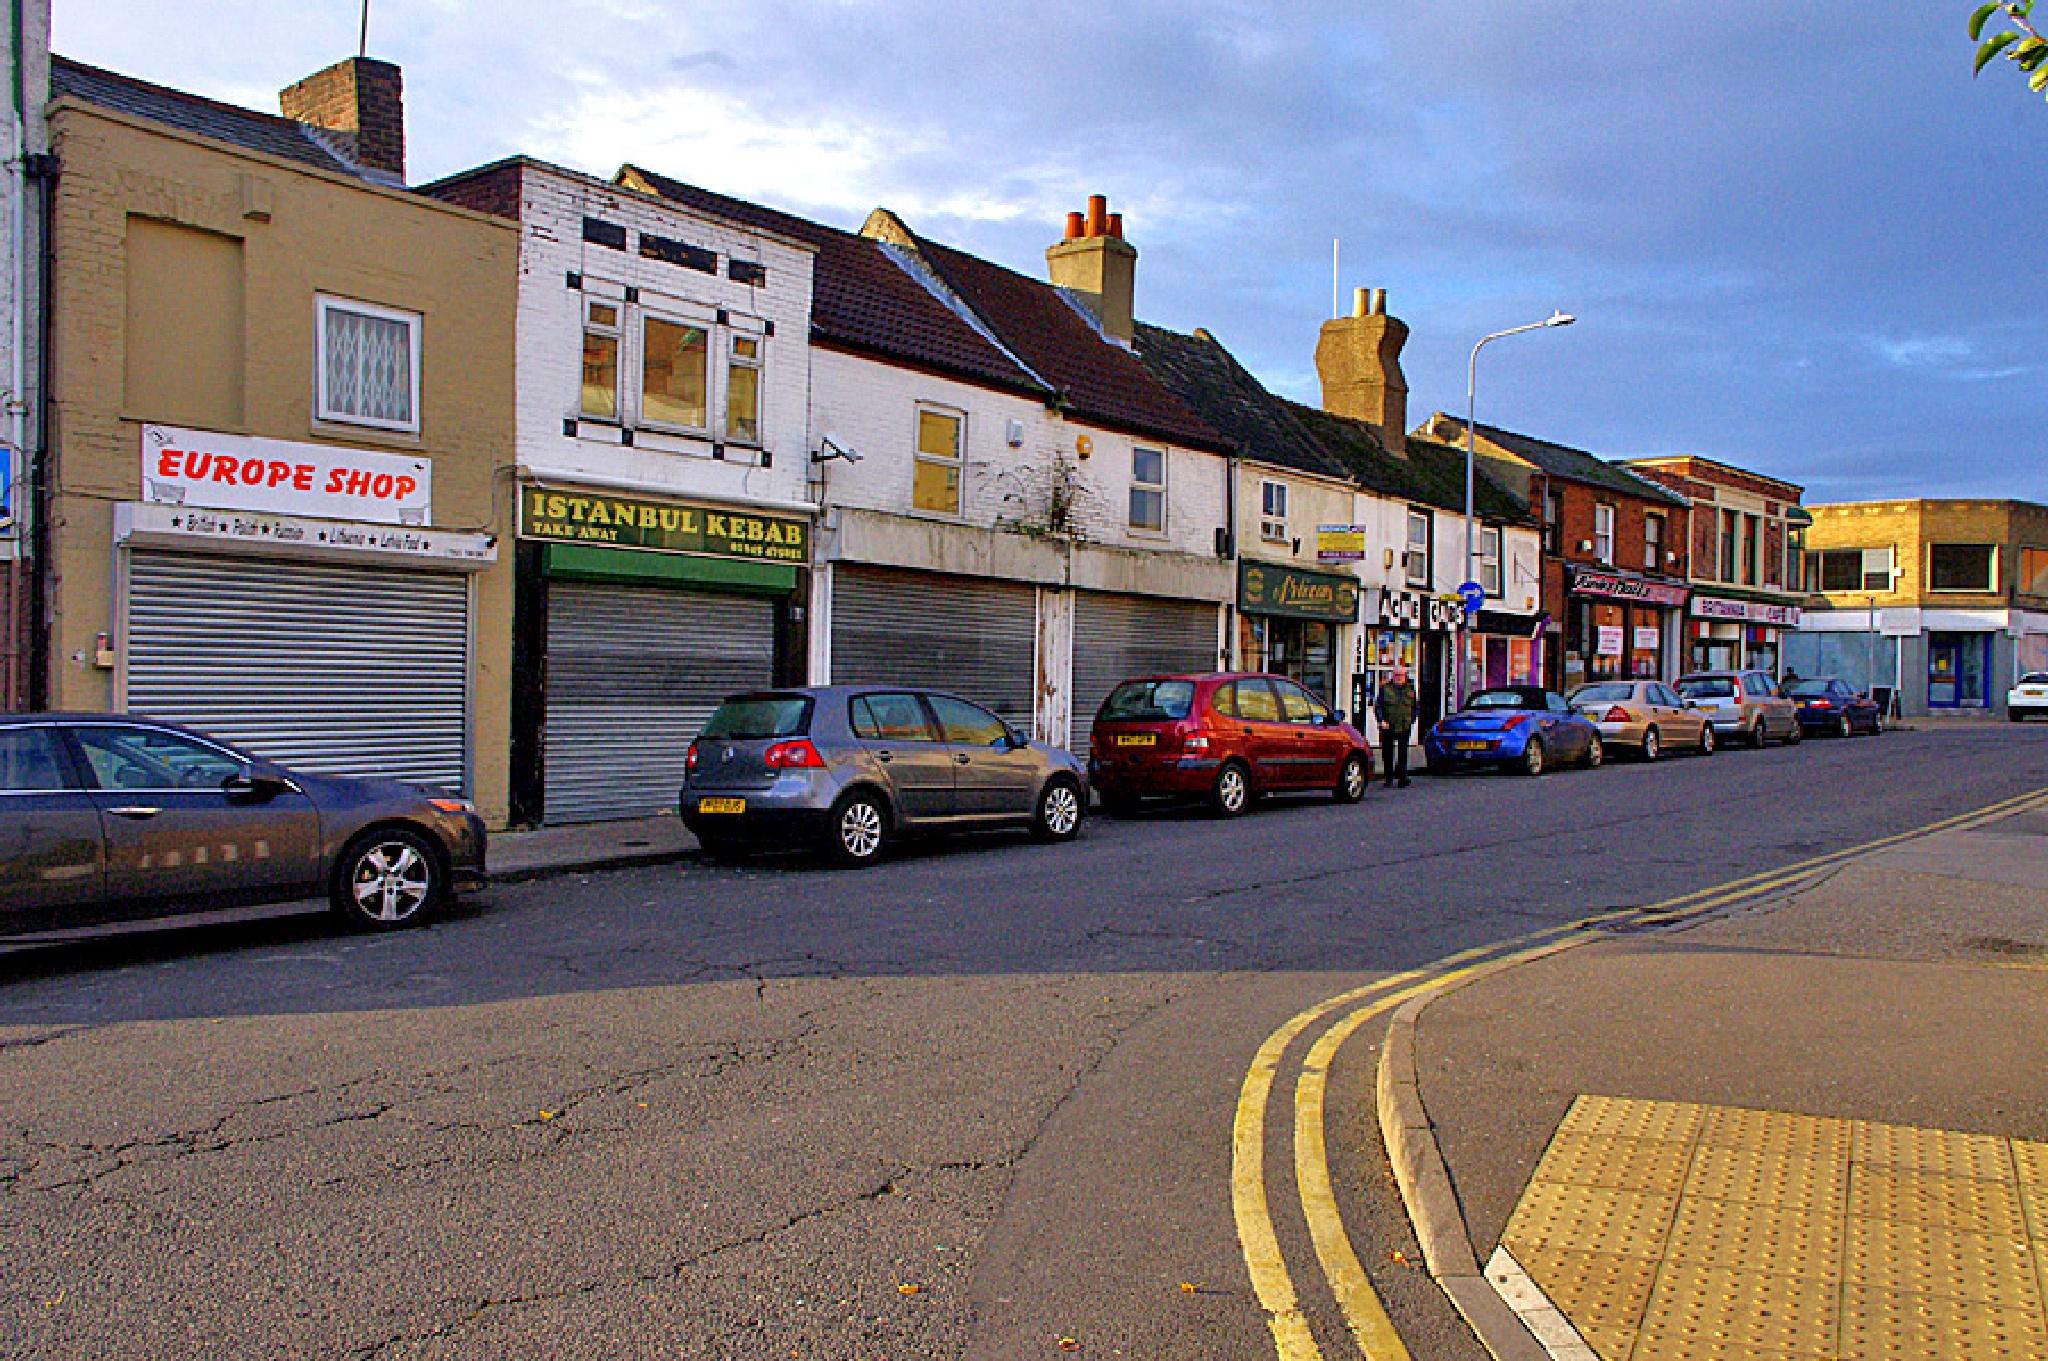 Wisbech East Street 08.45am 5 November 2014  by Owen Smithers